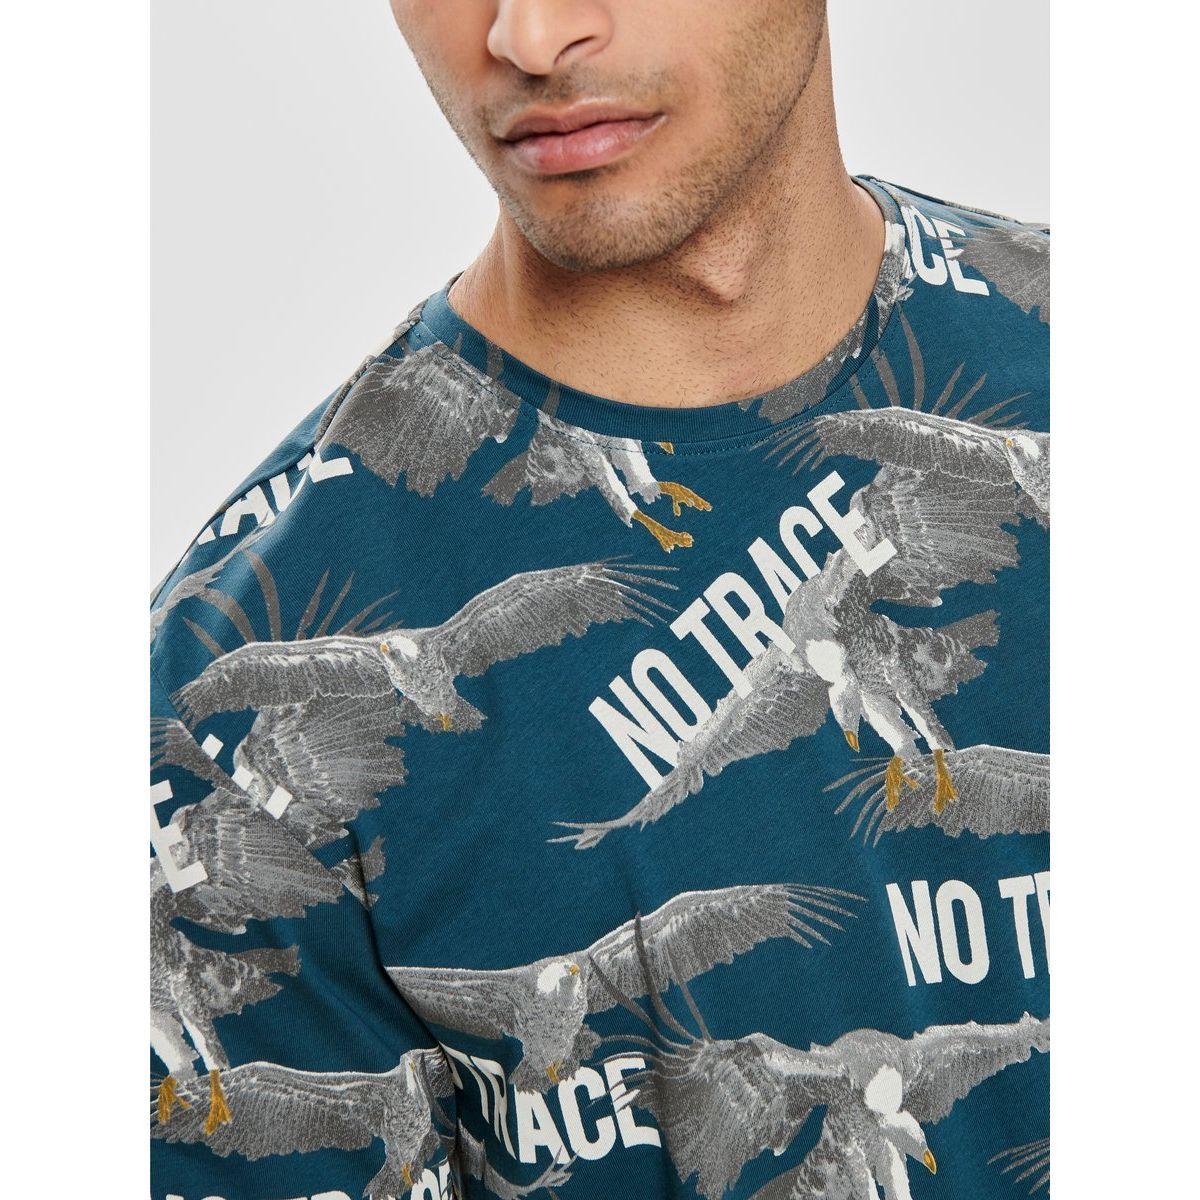 T shirt Imprimé Taille : L;M;S;XL;2XL | T shirt, Ralph